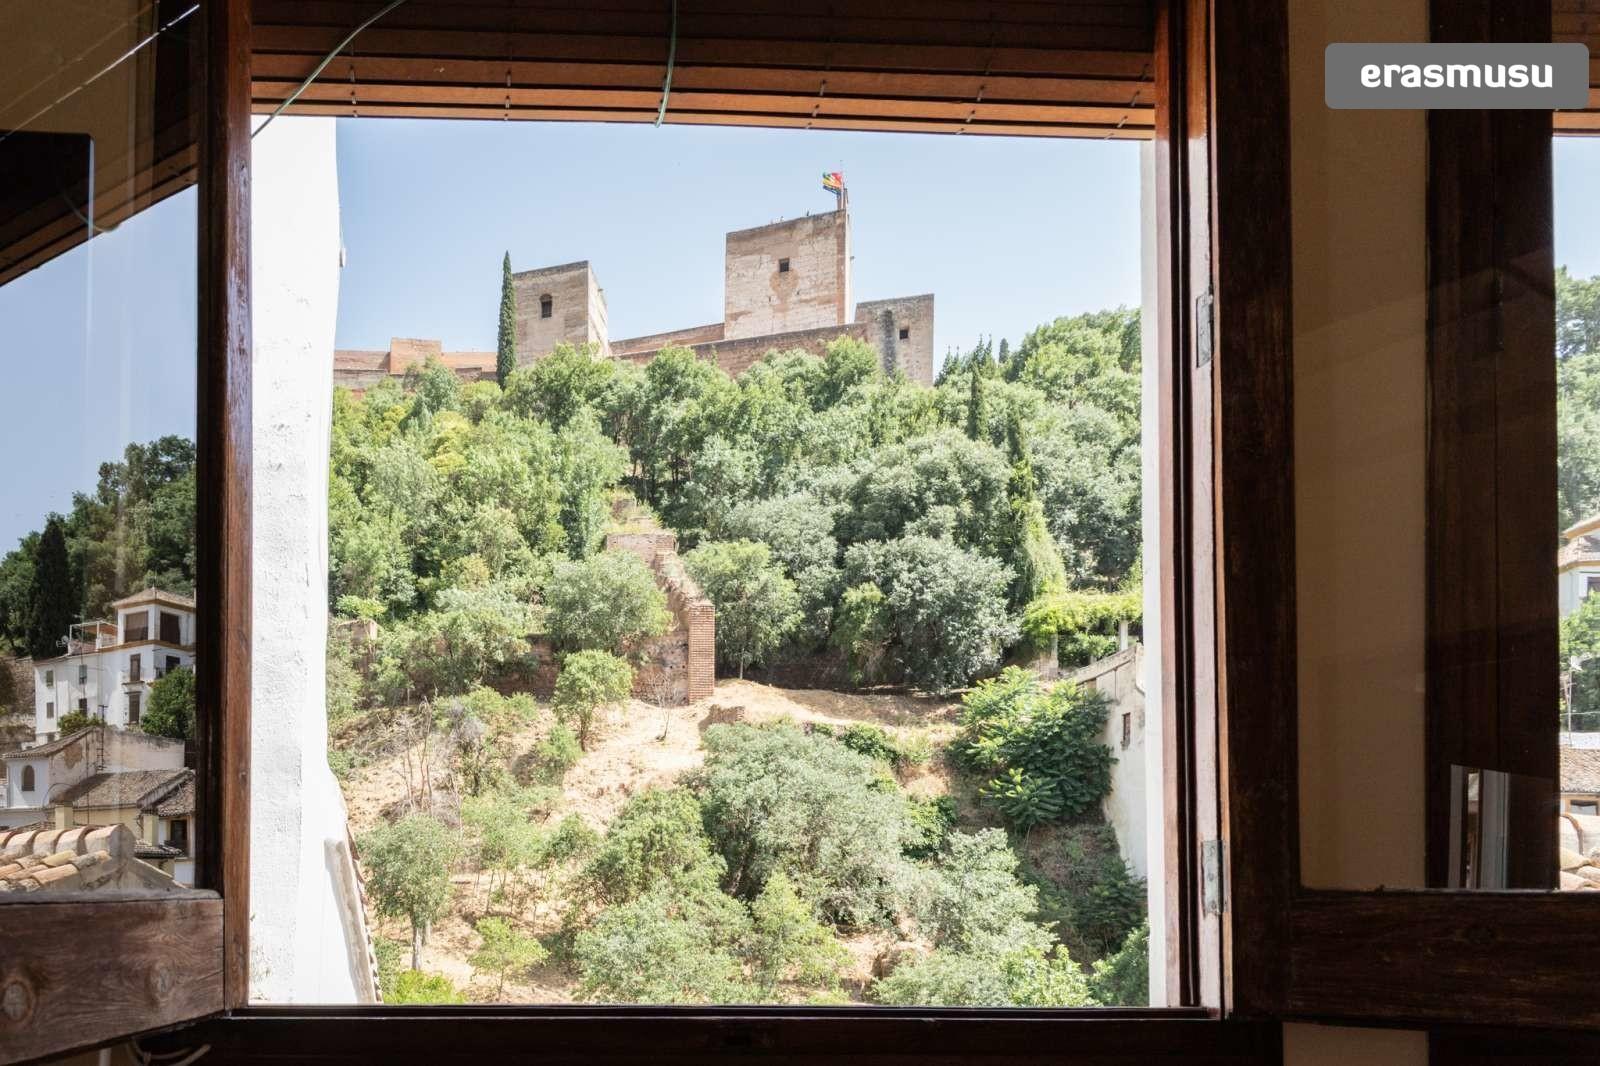 Carrera del Darro, 18010 Granada, Spain